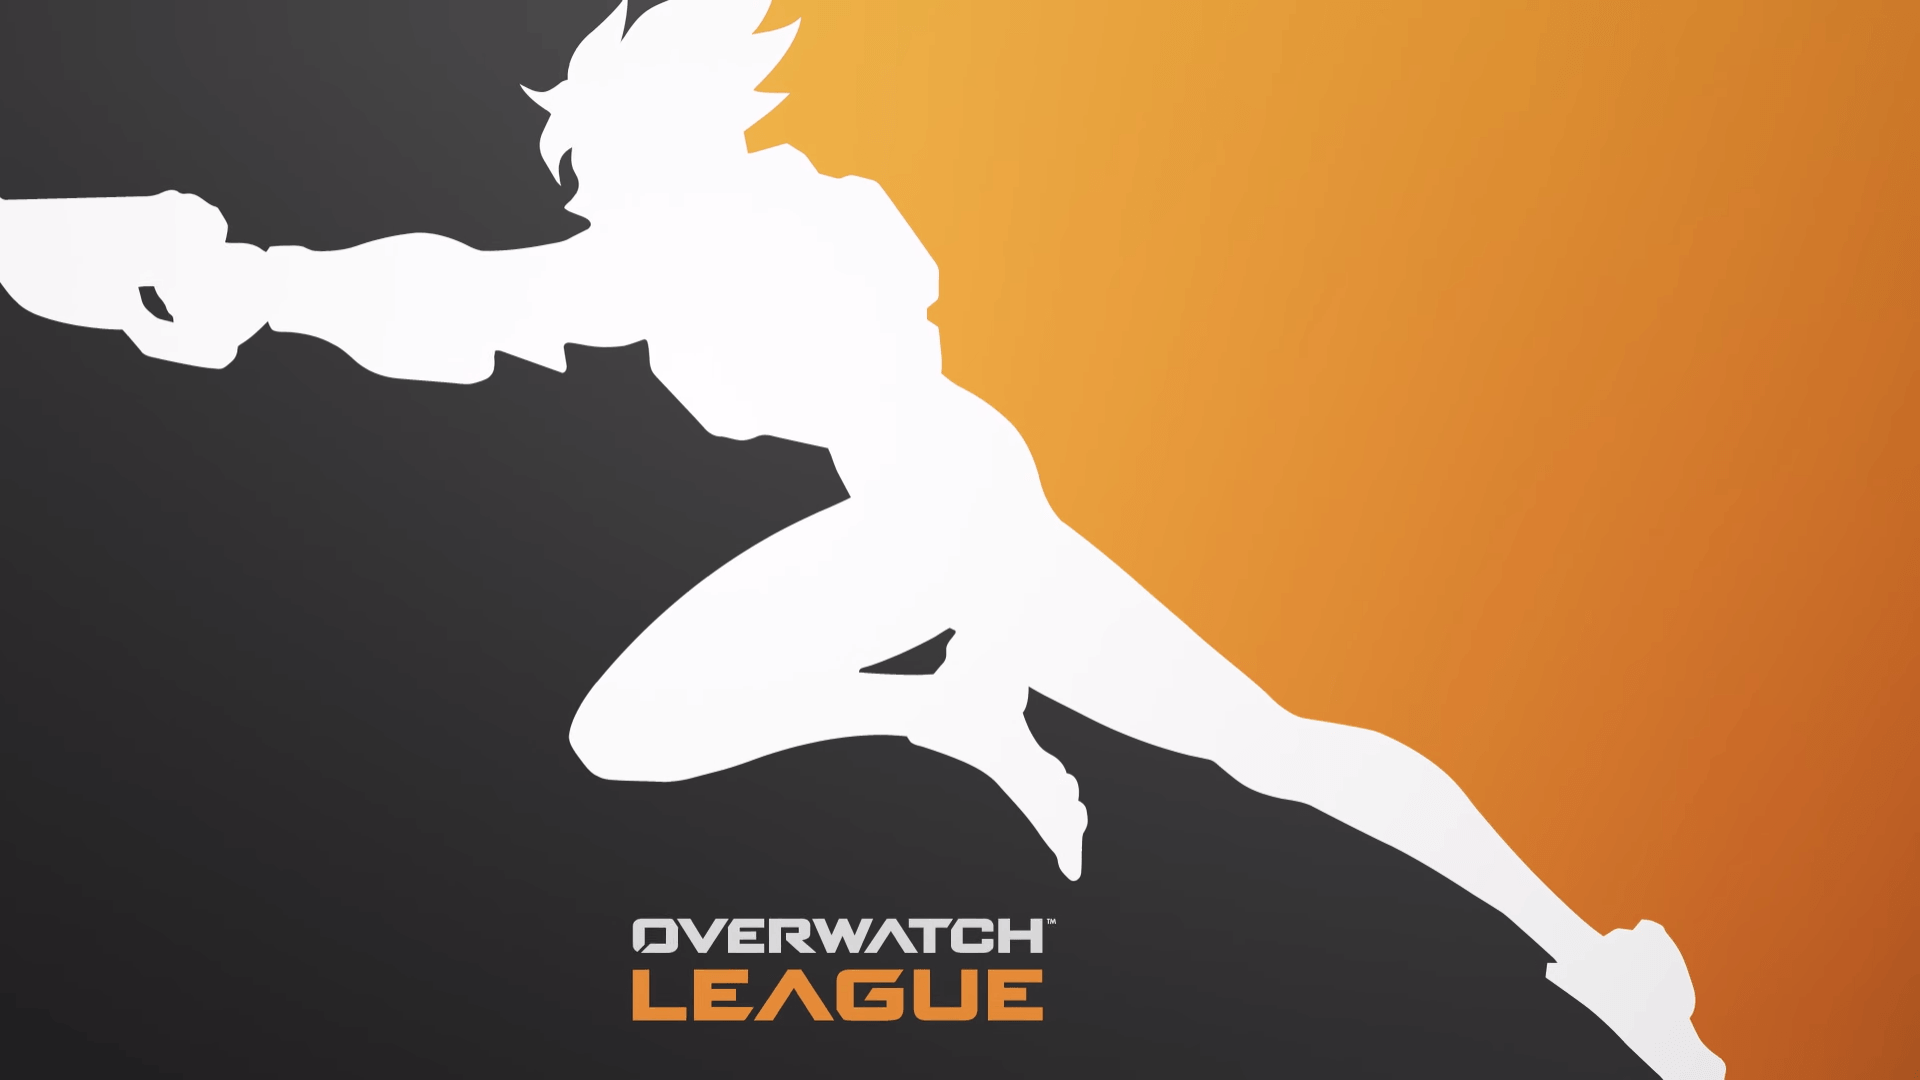 Overwatch League Wallpapers Wallpaper Cave